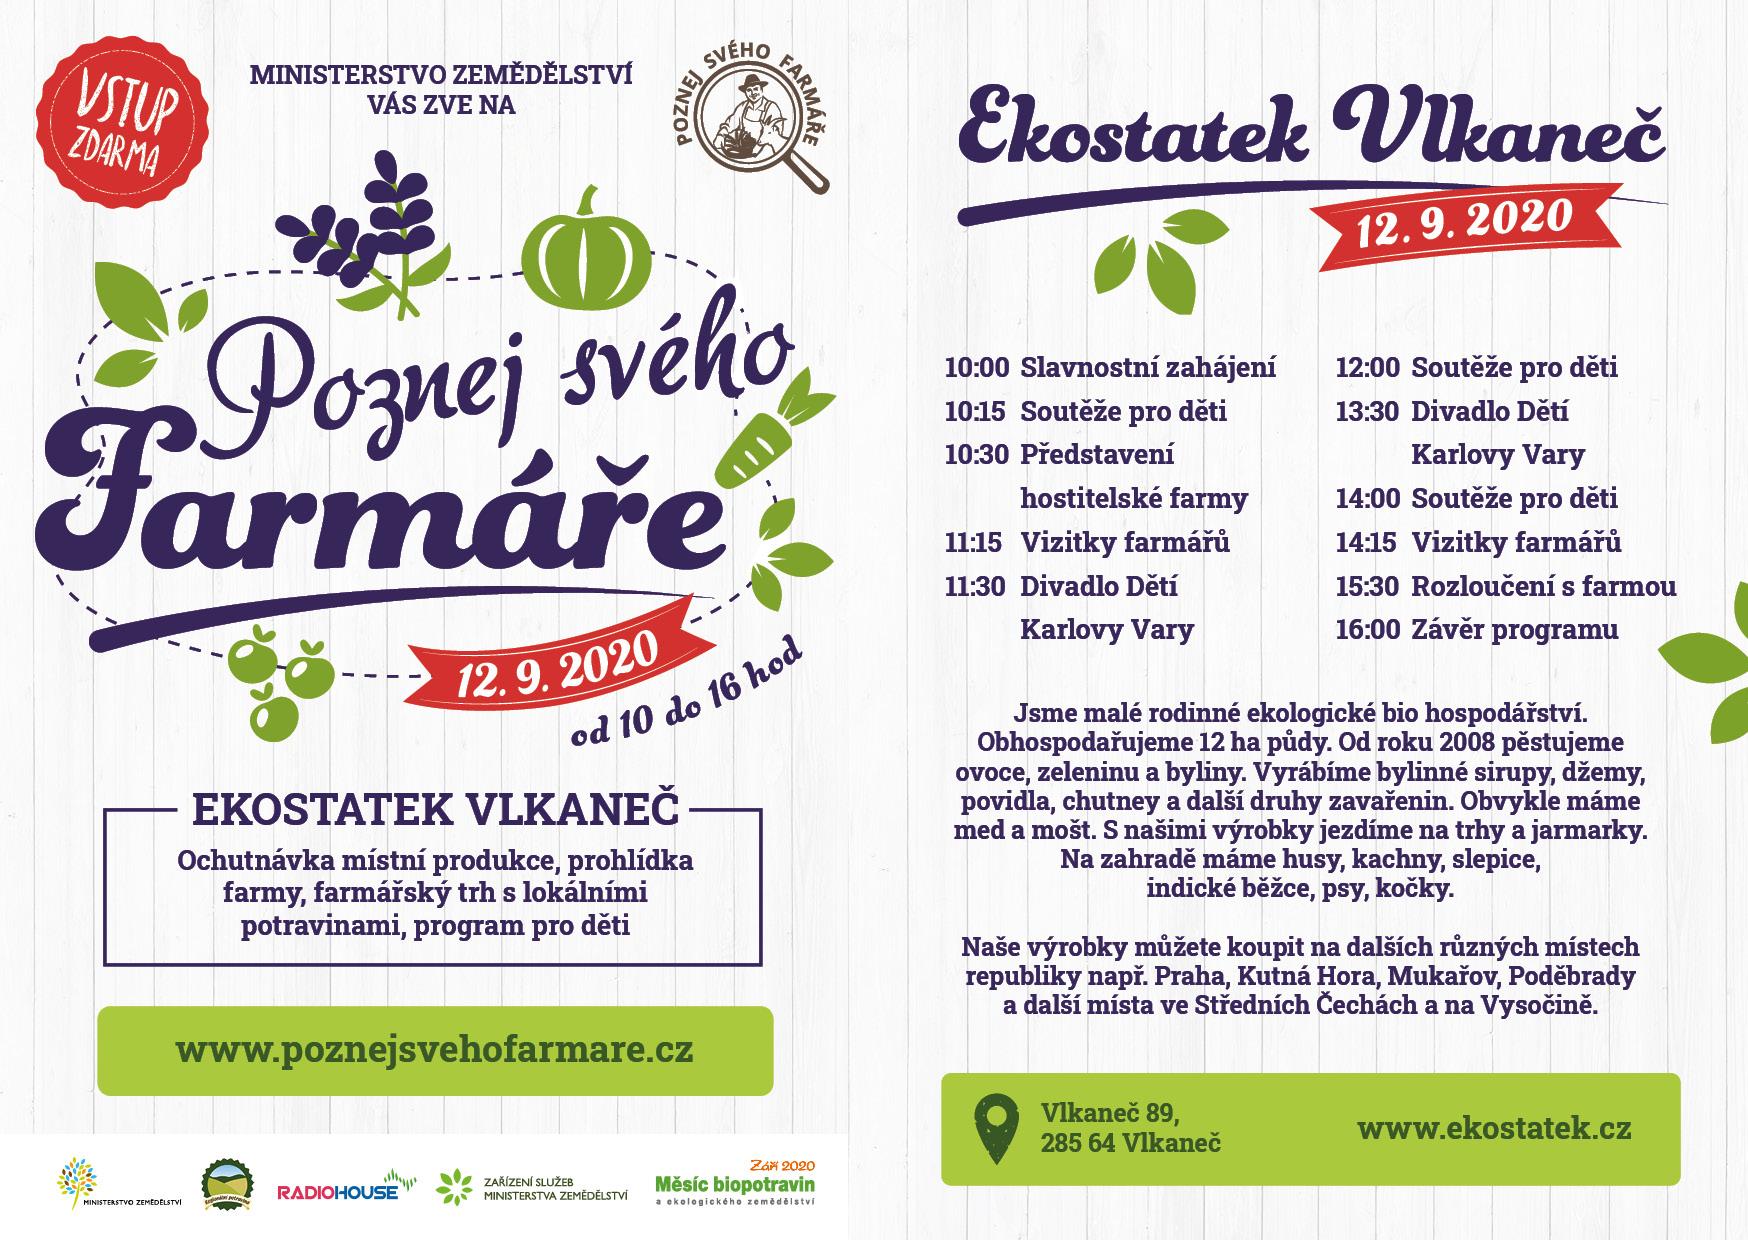 You are currently viewing Ekostatek Vlkaneč